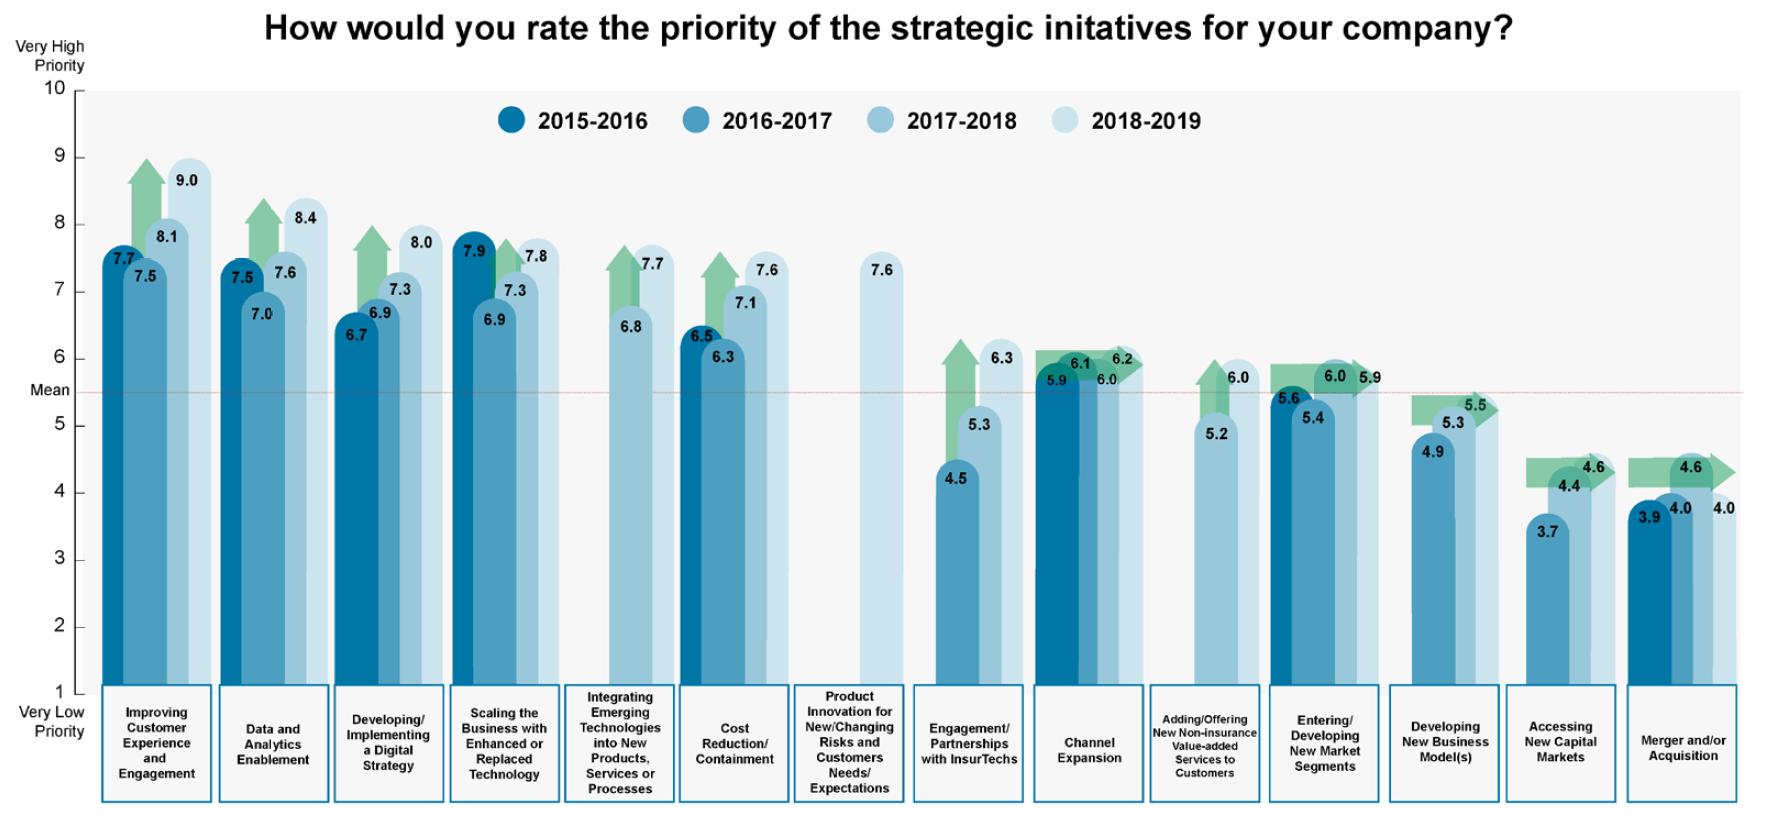 Insurers' strategic initiatives